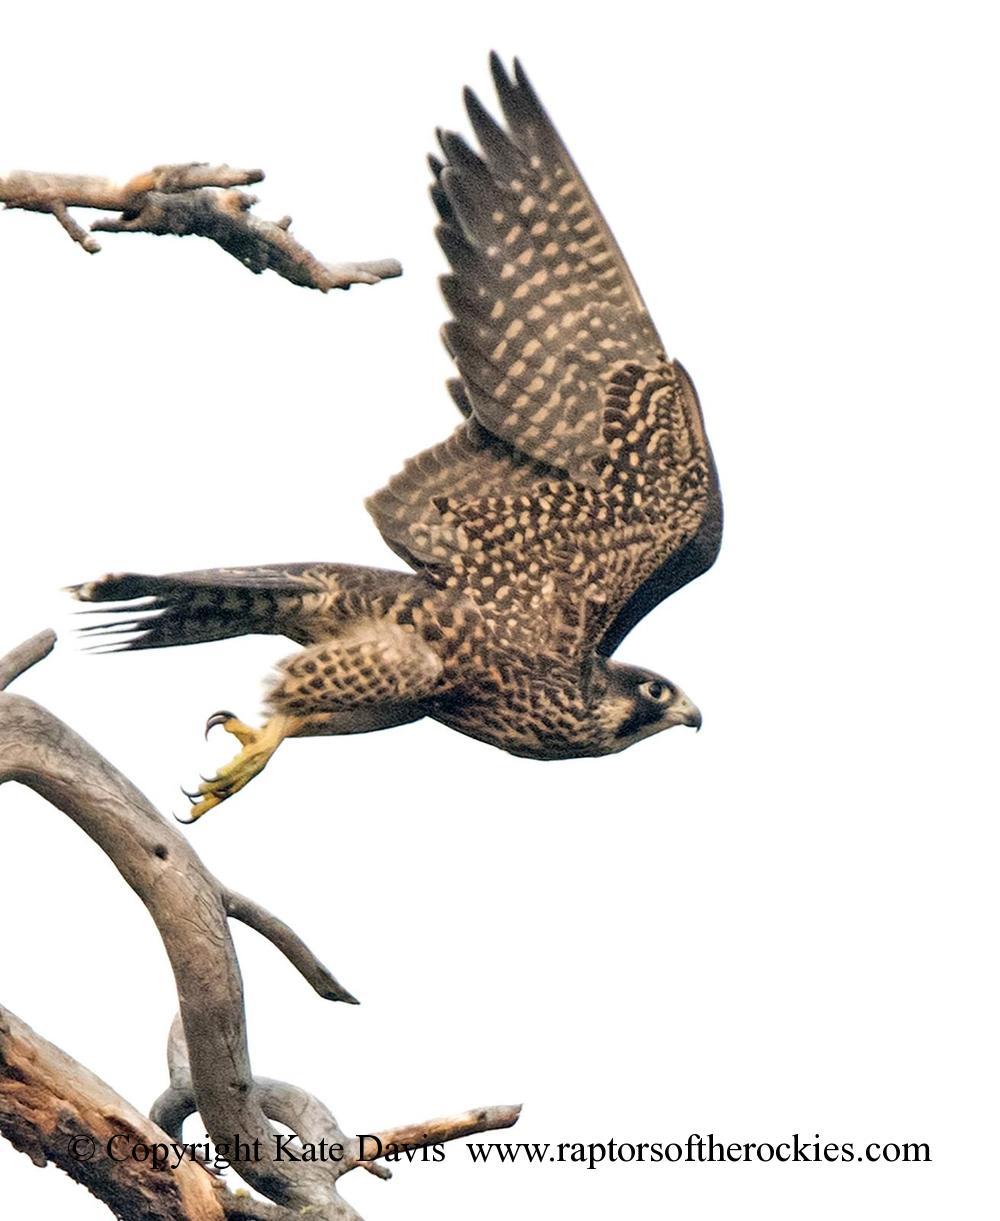 Peregrine Falcon - Youngster Peregrine - American Kestrel - A fledgling falcon at the river, cool